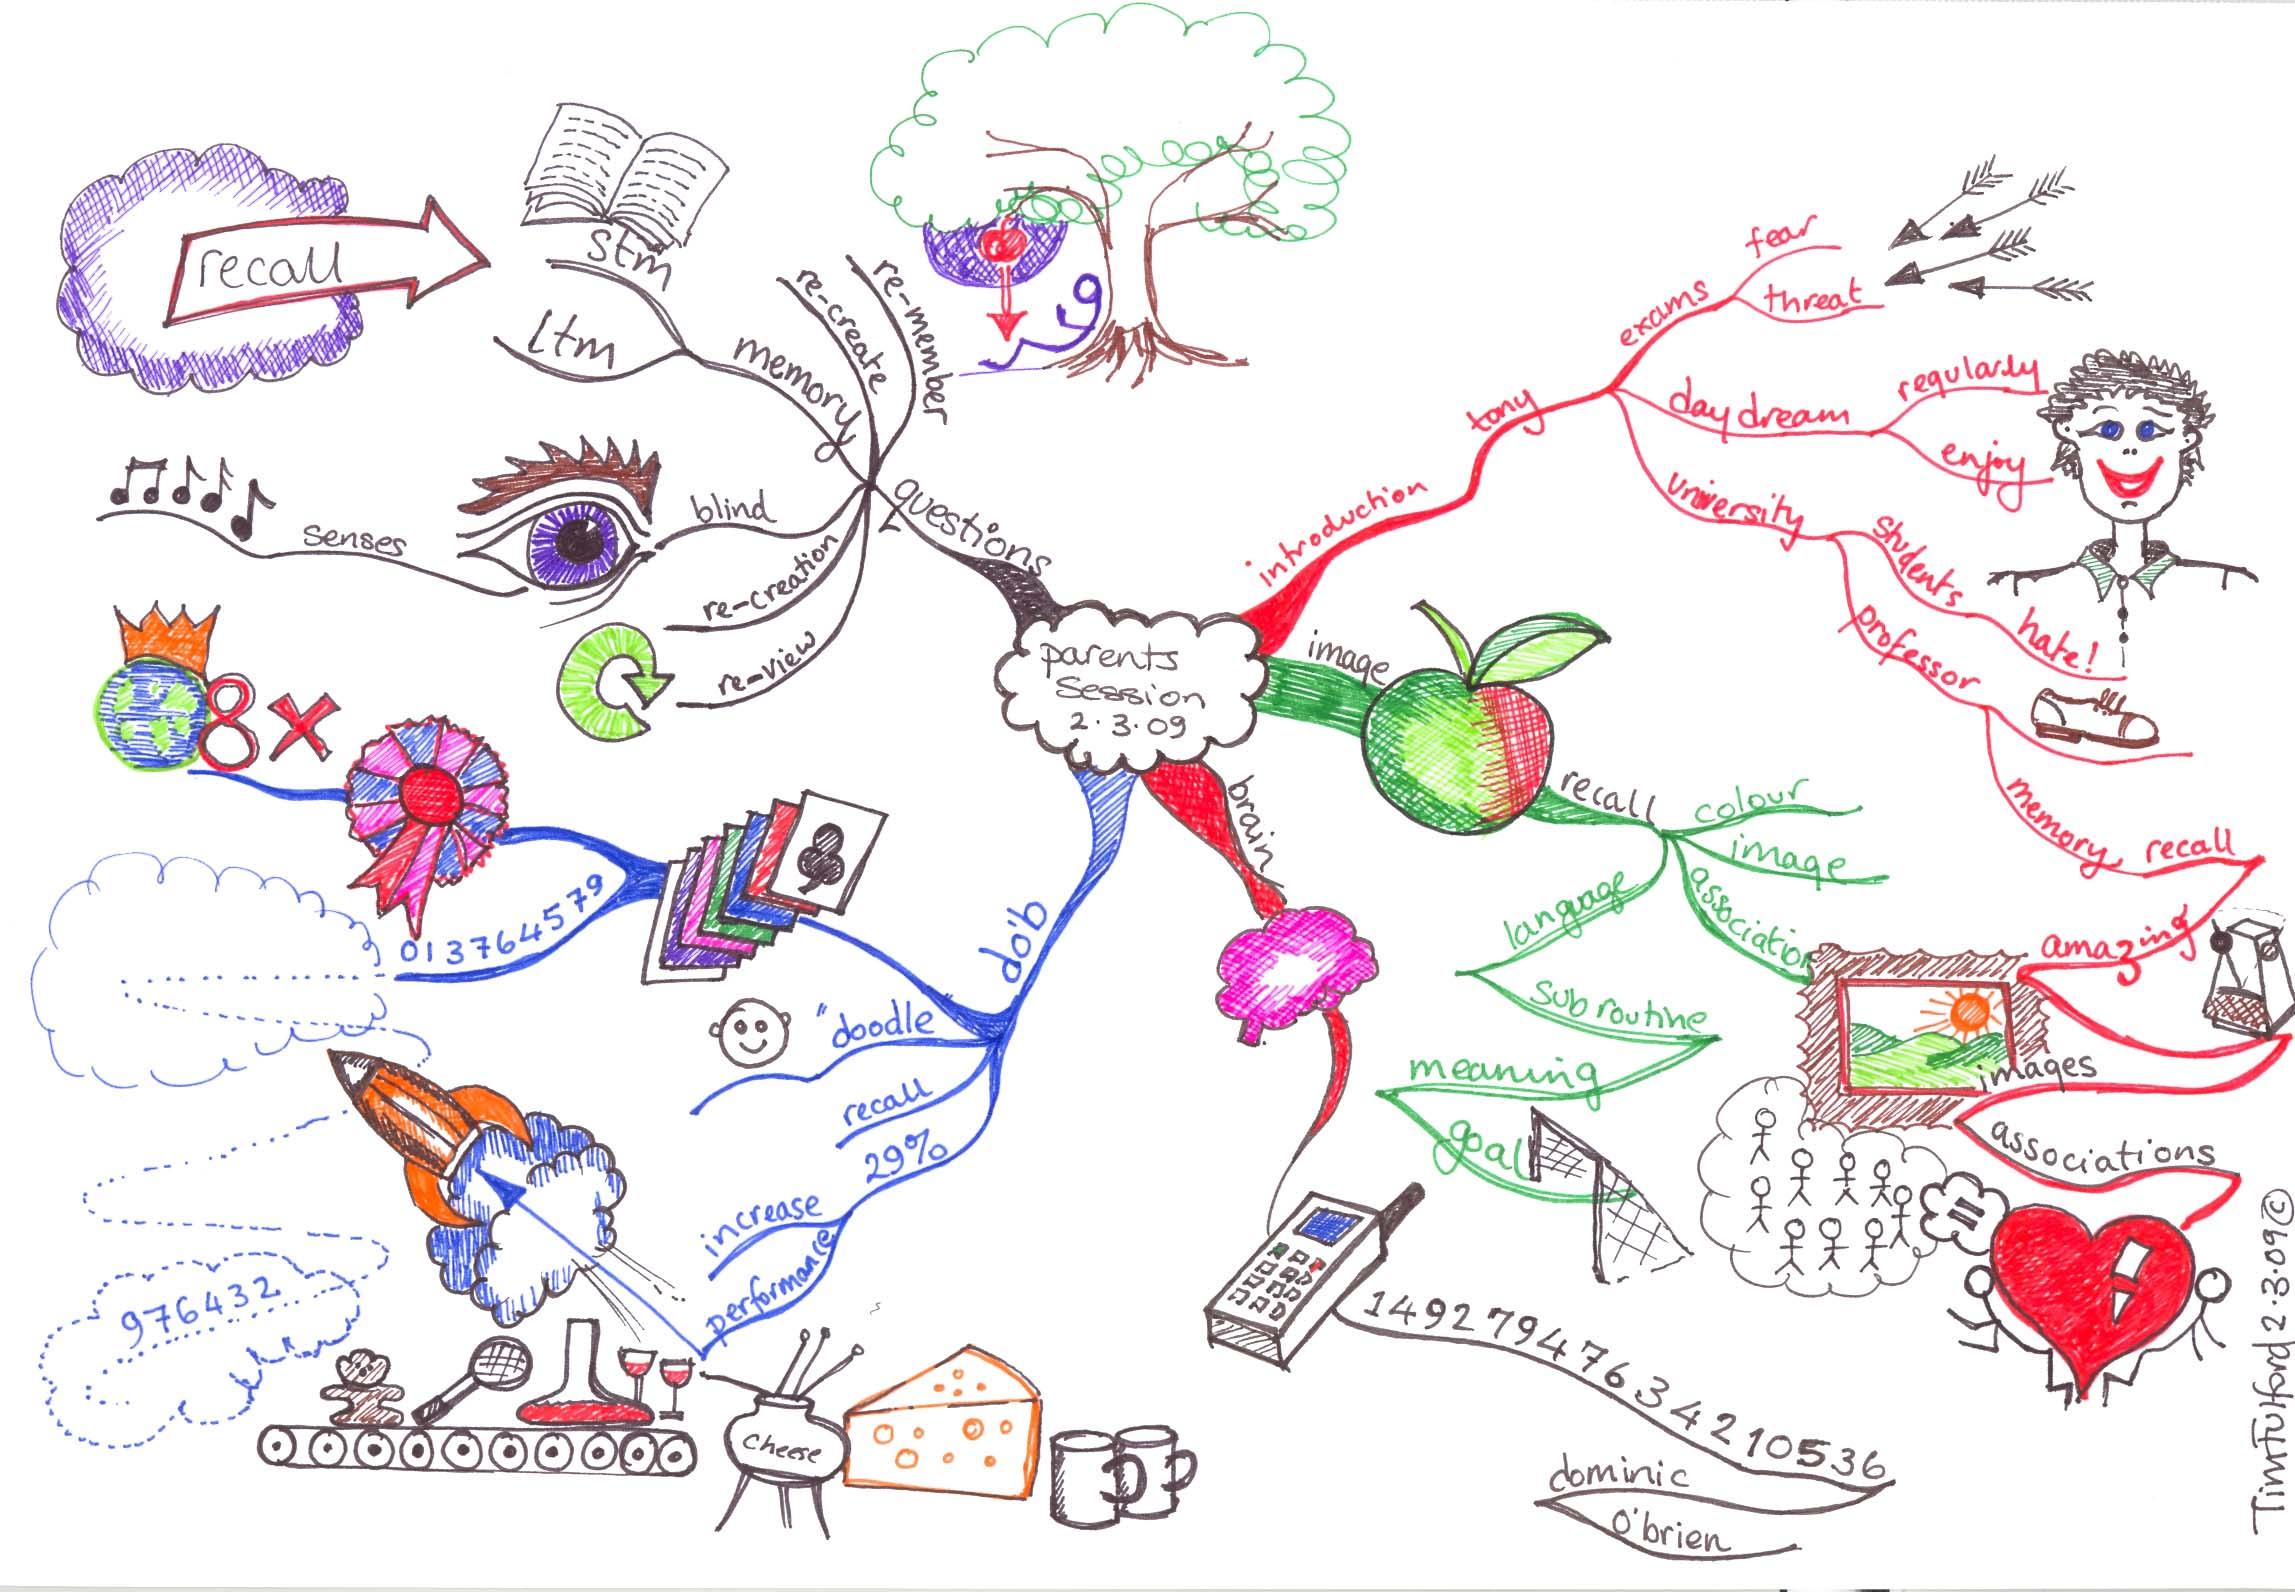 the ultimate book of mind maps tony buzan pdf